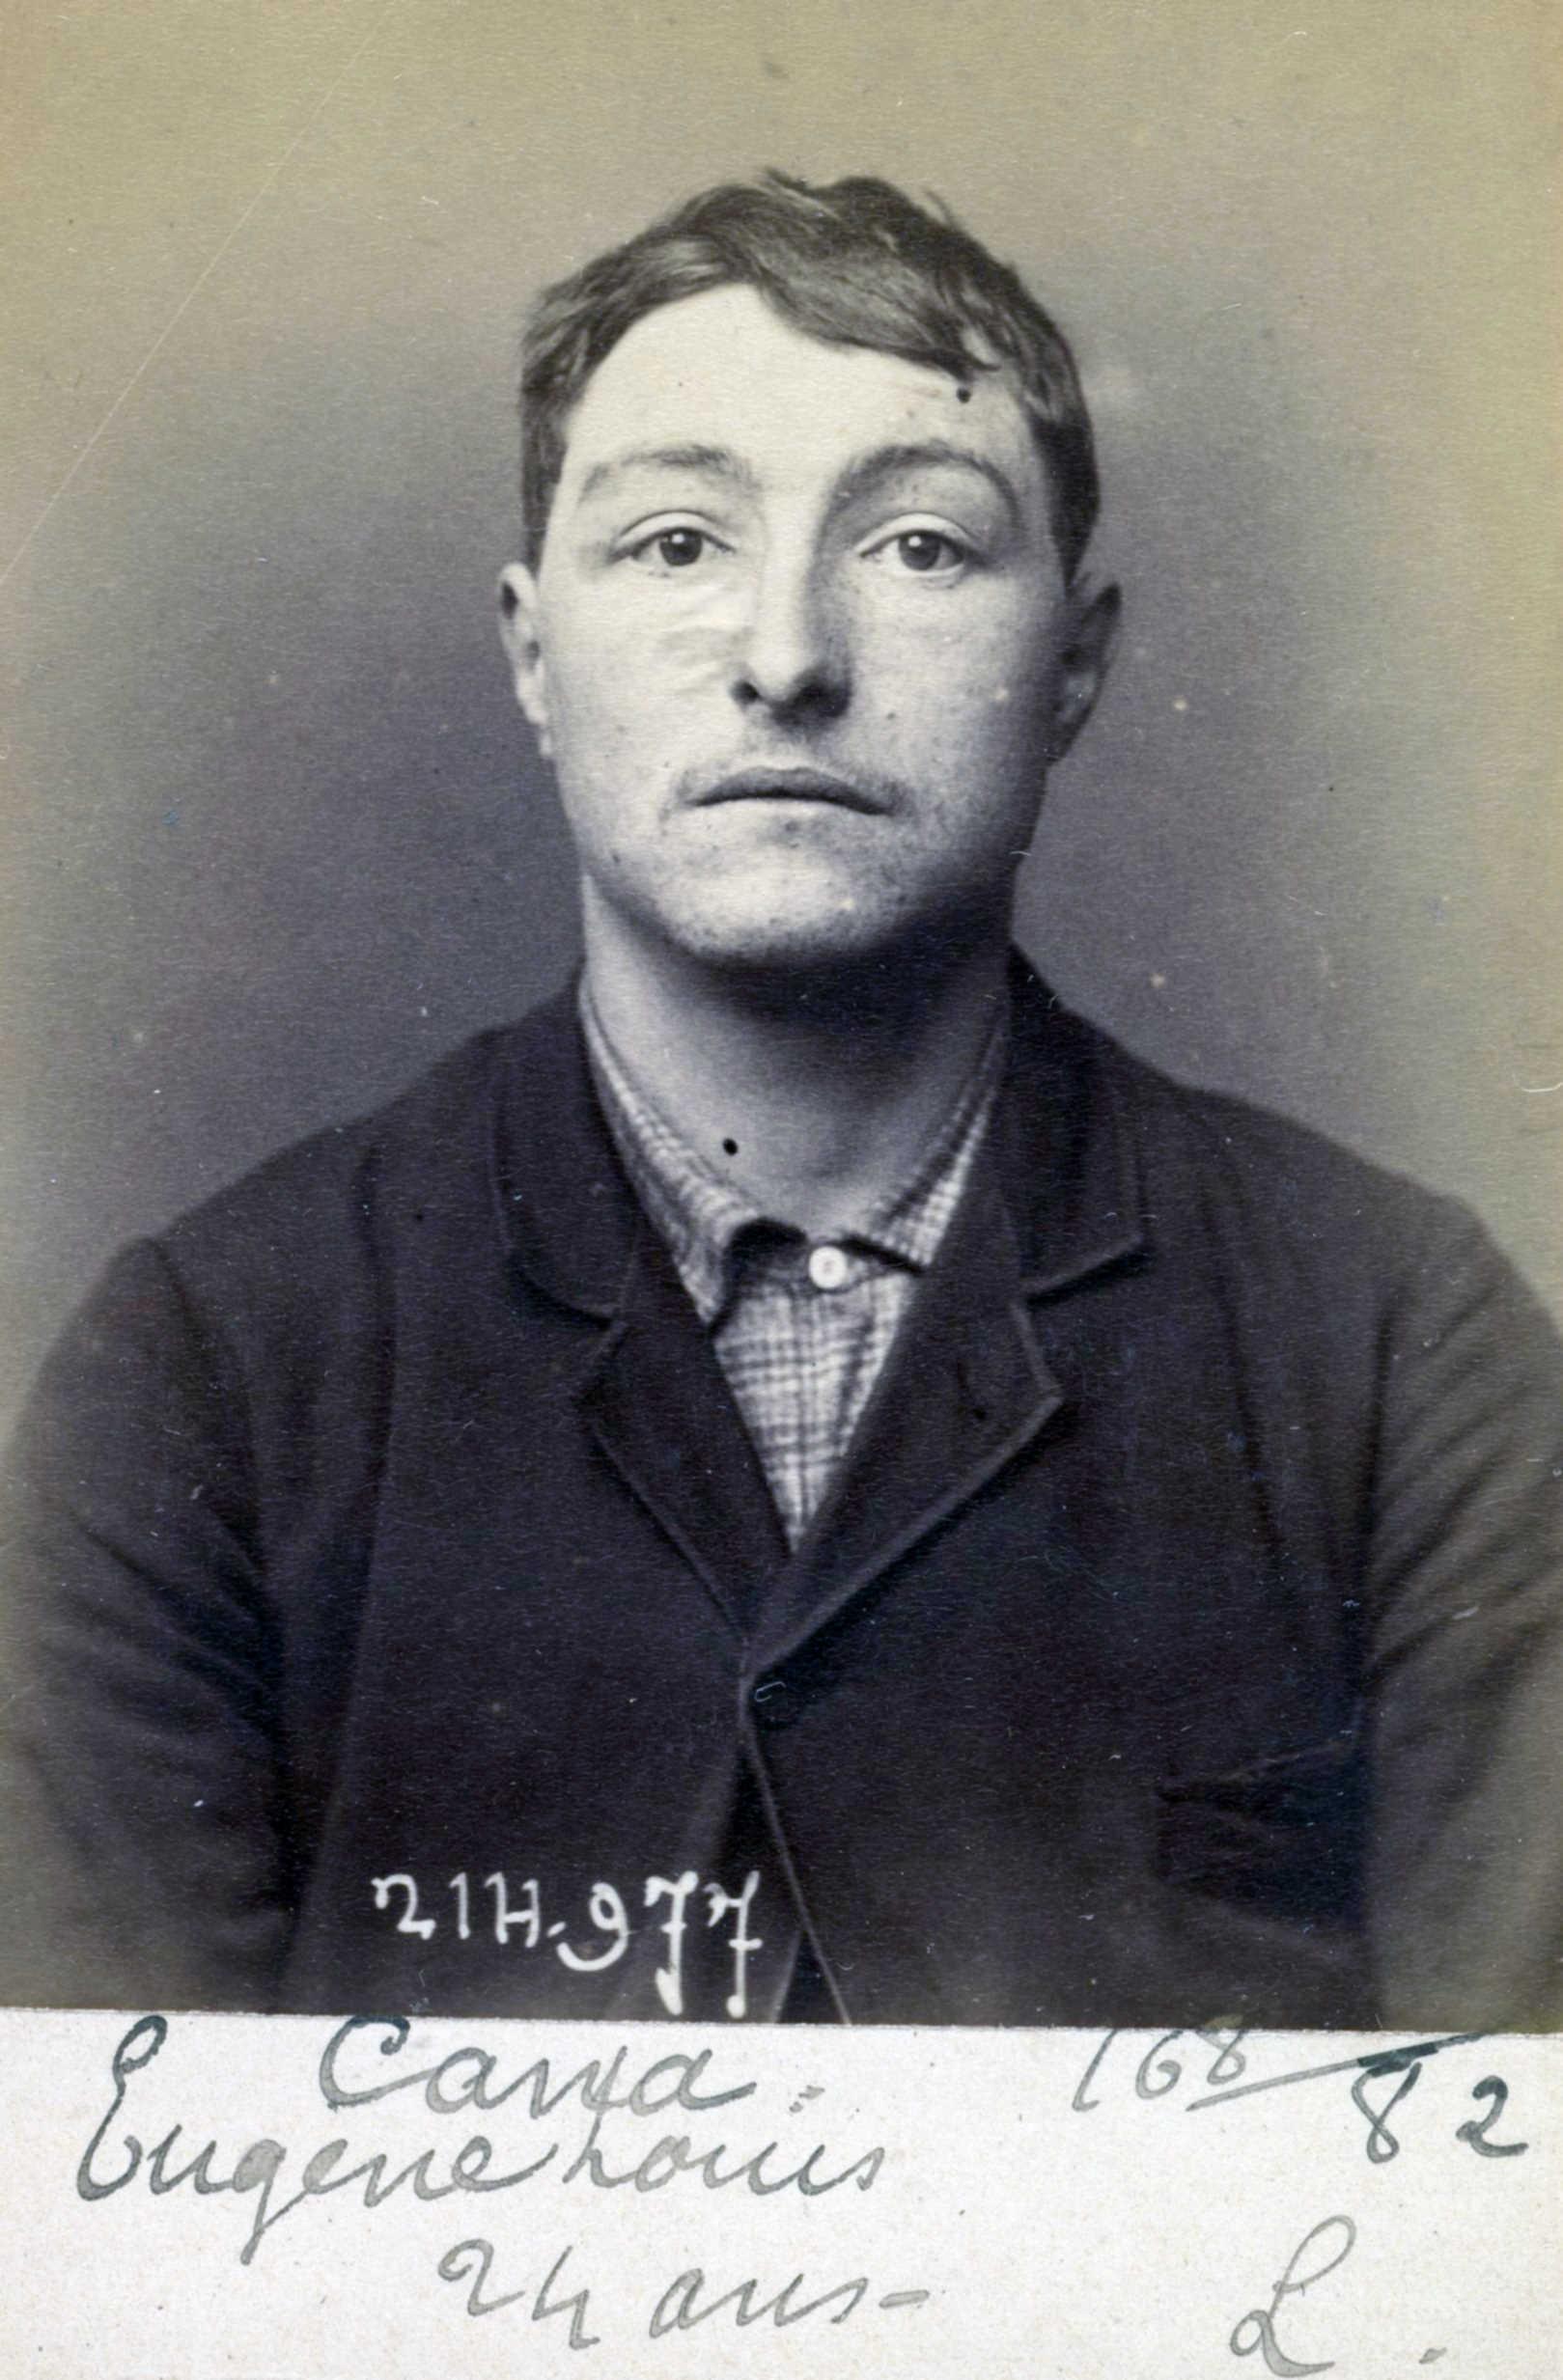 Fotografia policíaca d'Eugène Louis Cana (03 de març de 1894)